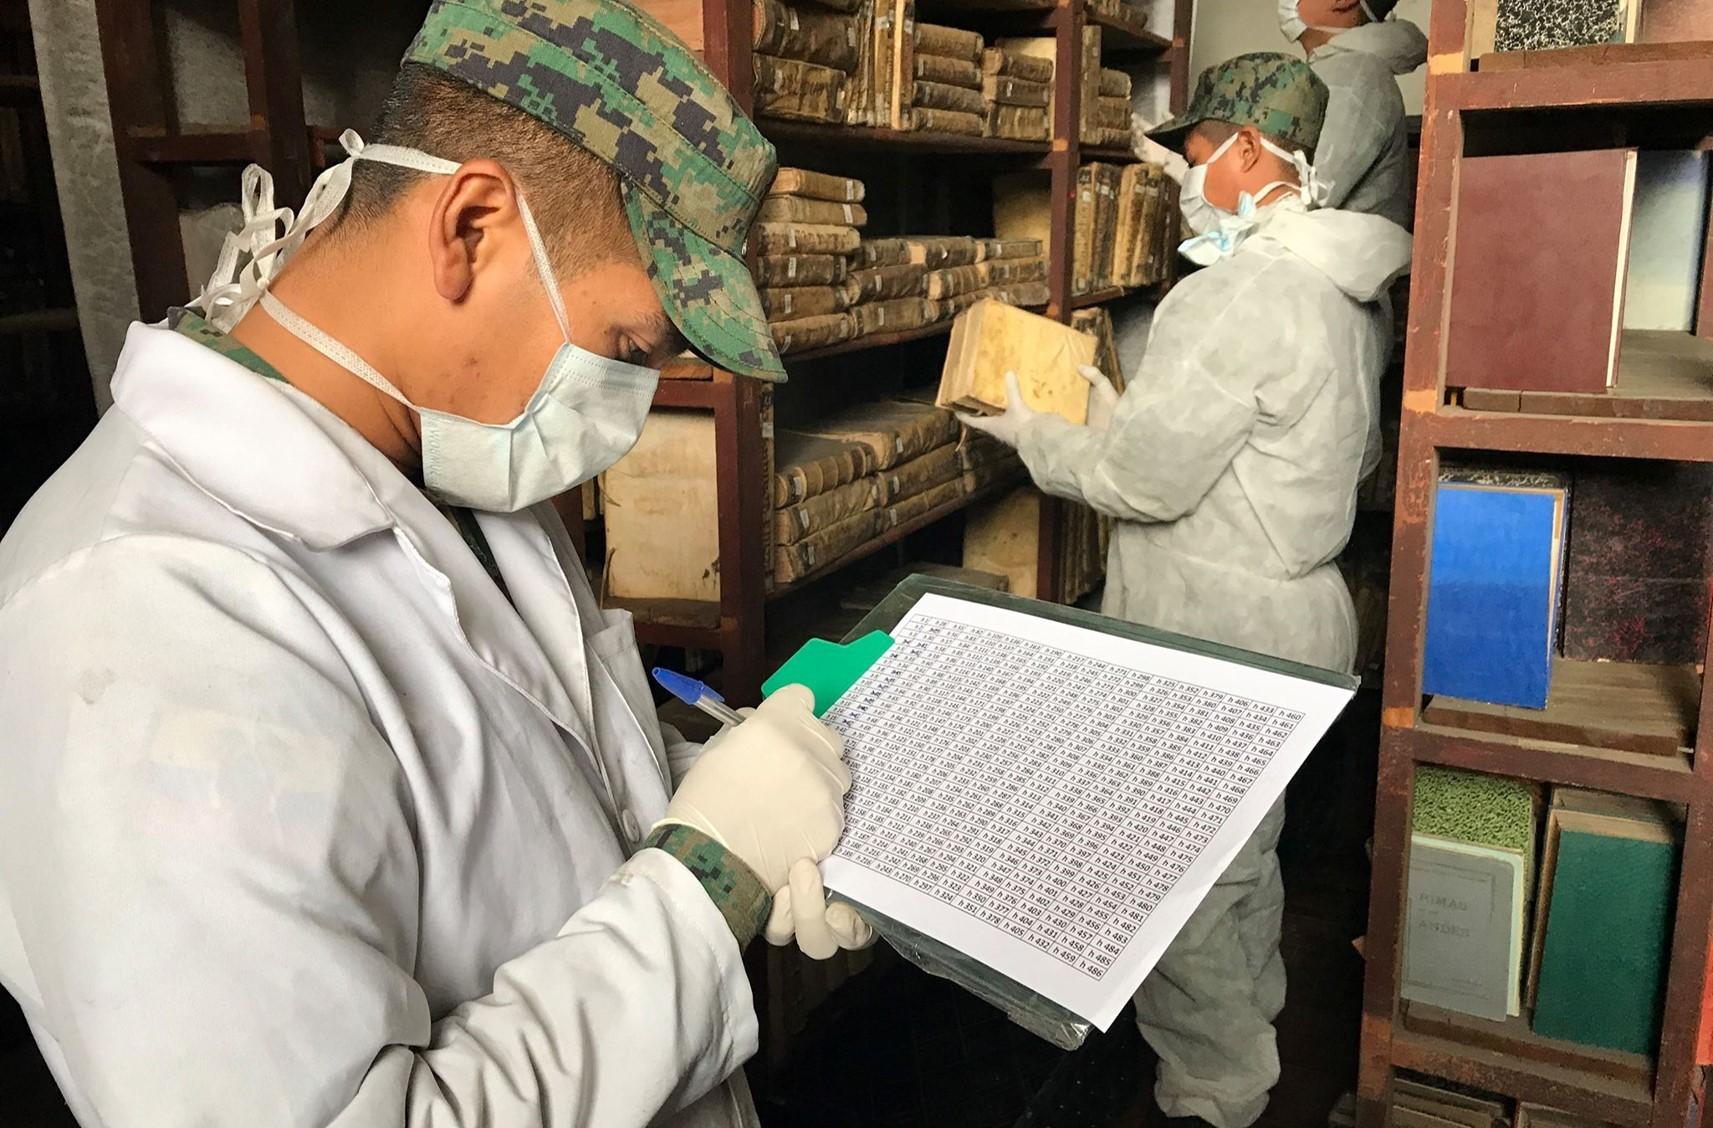 San Augustine Making careful inventory